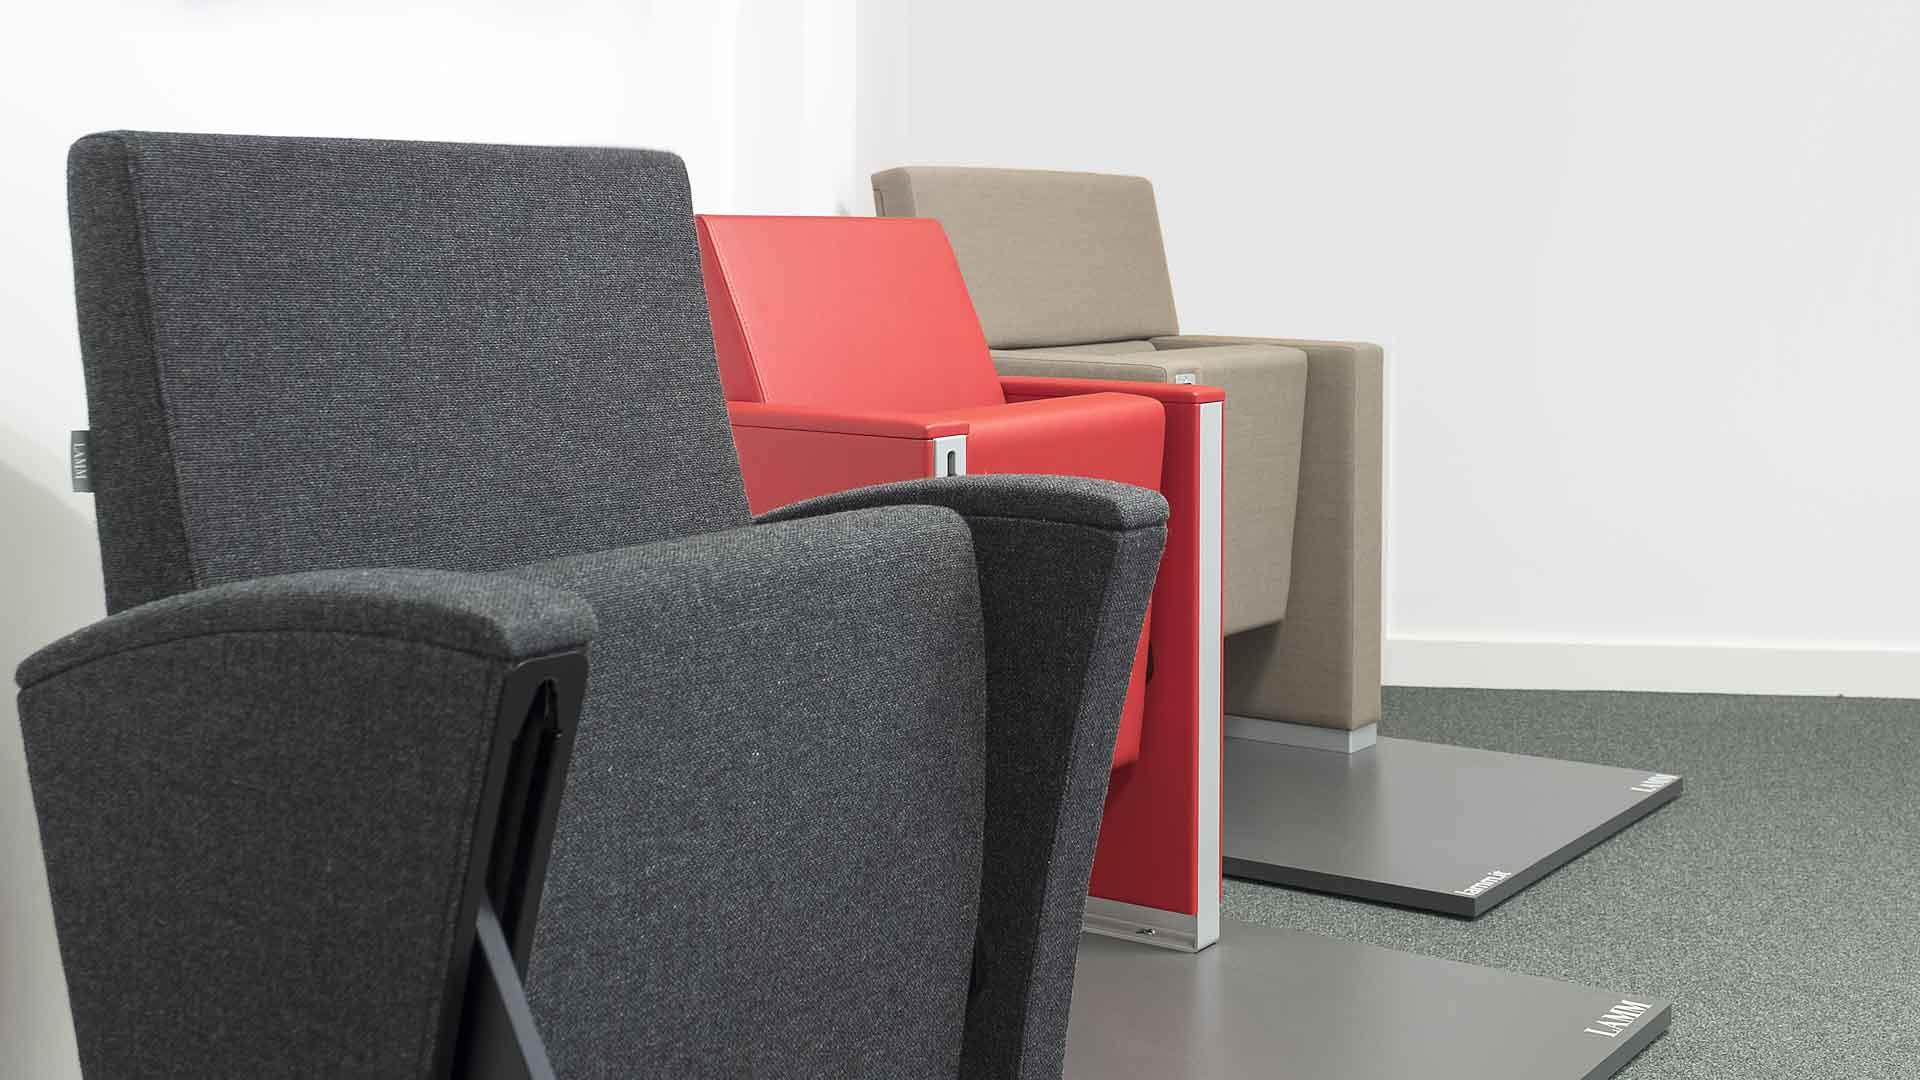 LAMM Seating at Woodwood Group Showroom